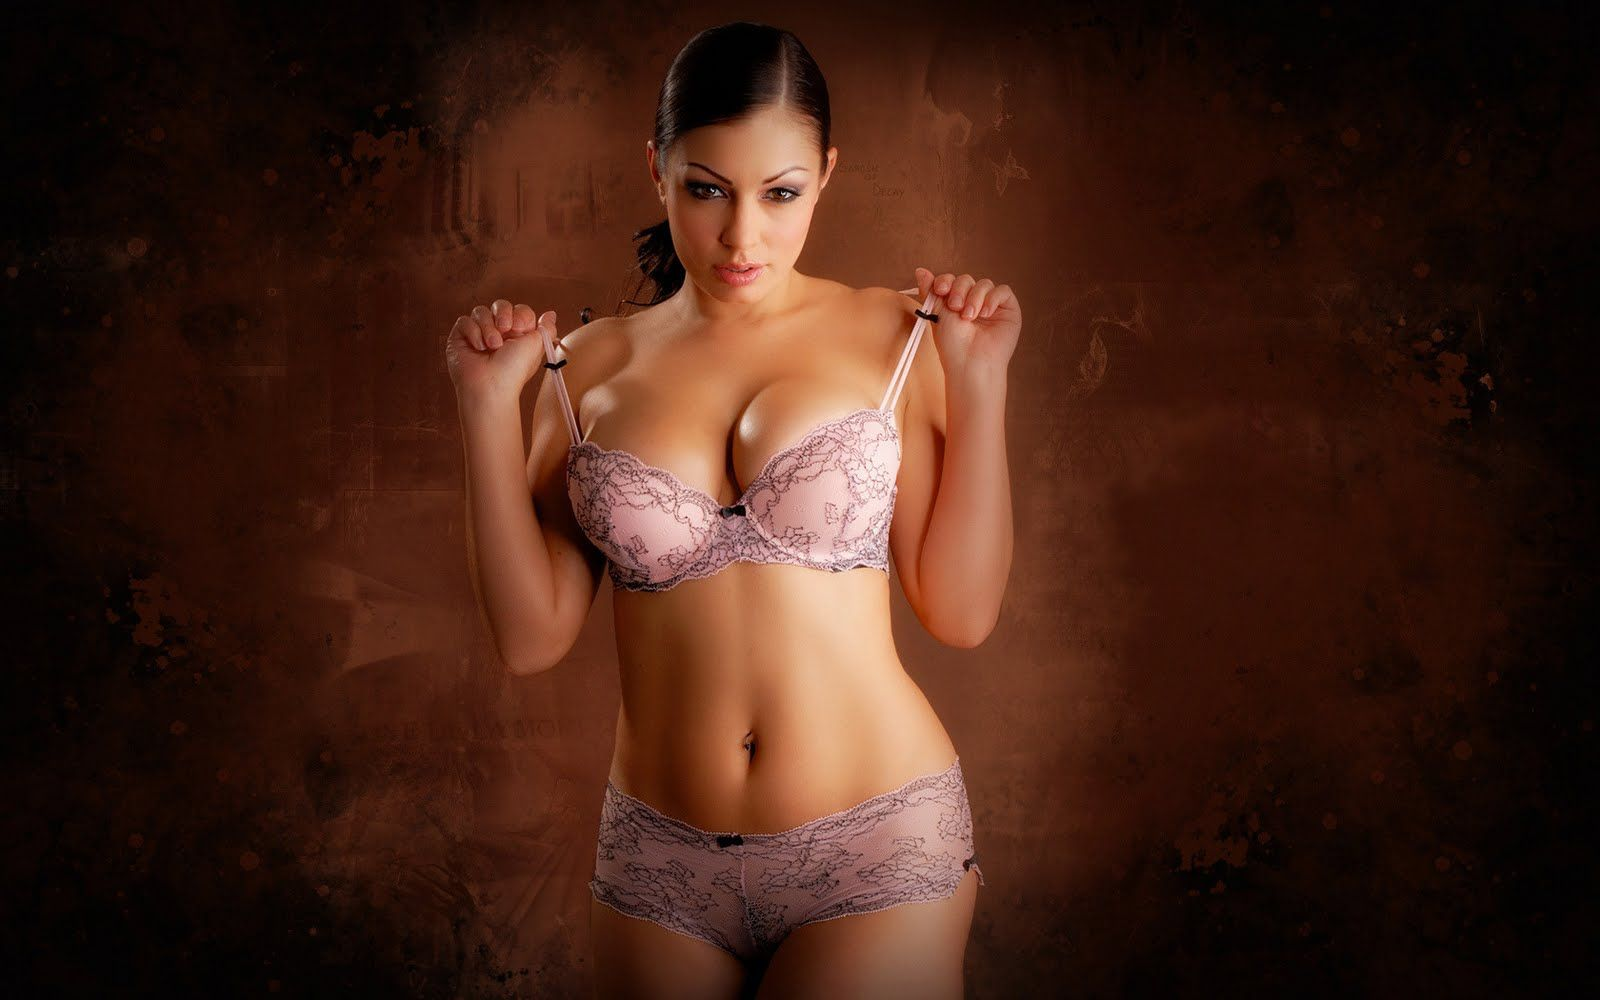 Фото ариа джовани, Aria Giovanni - все порно и секс фото модели 18 фотография